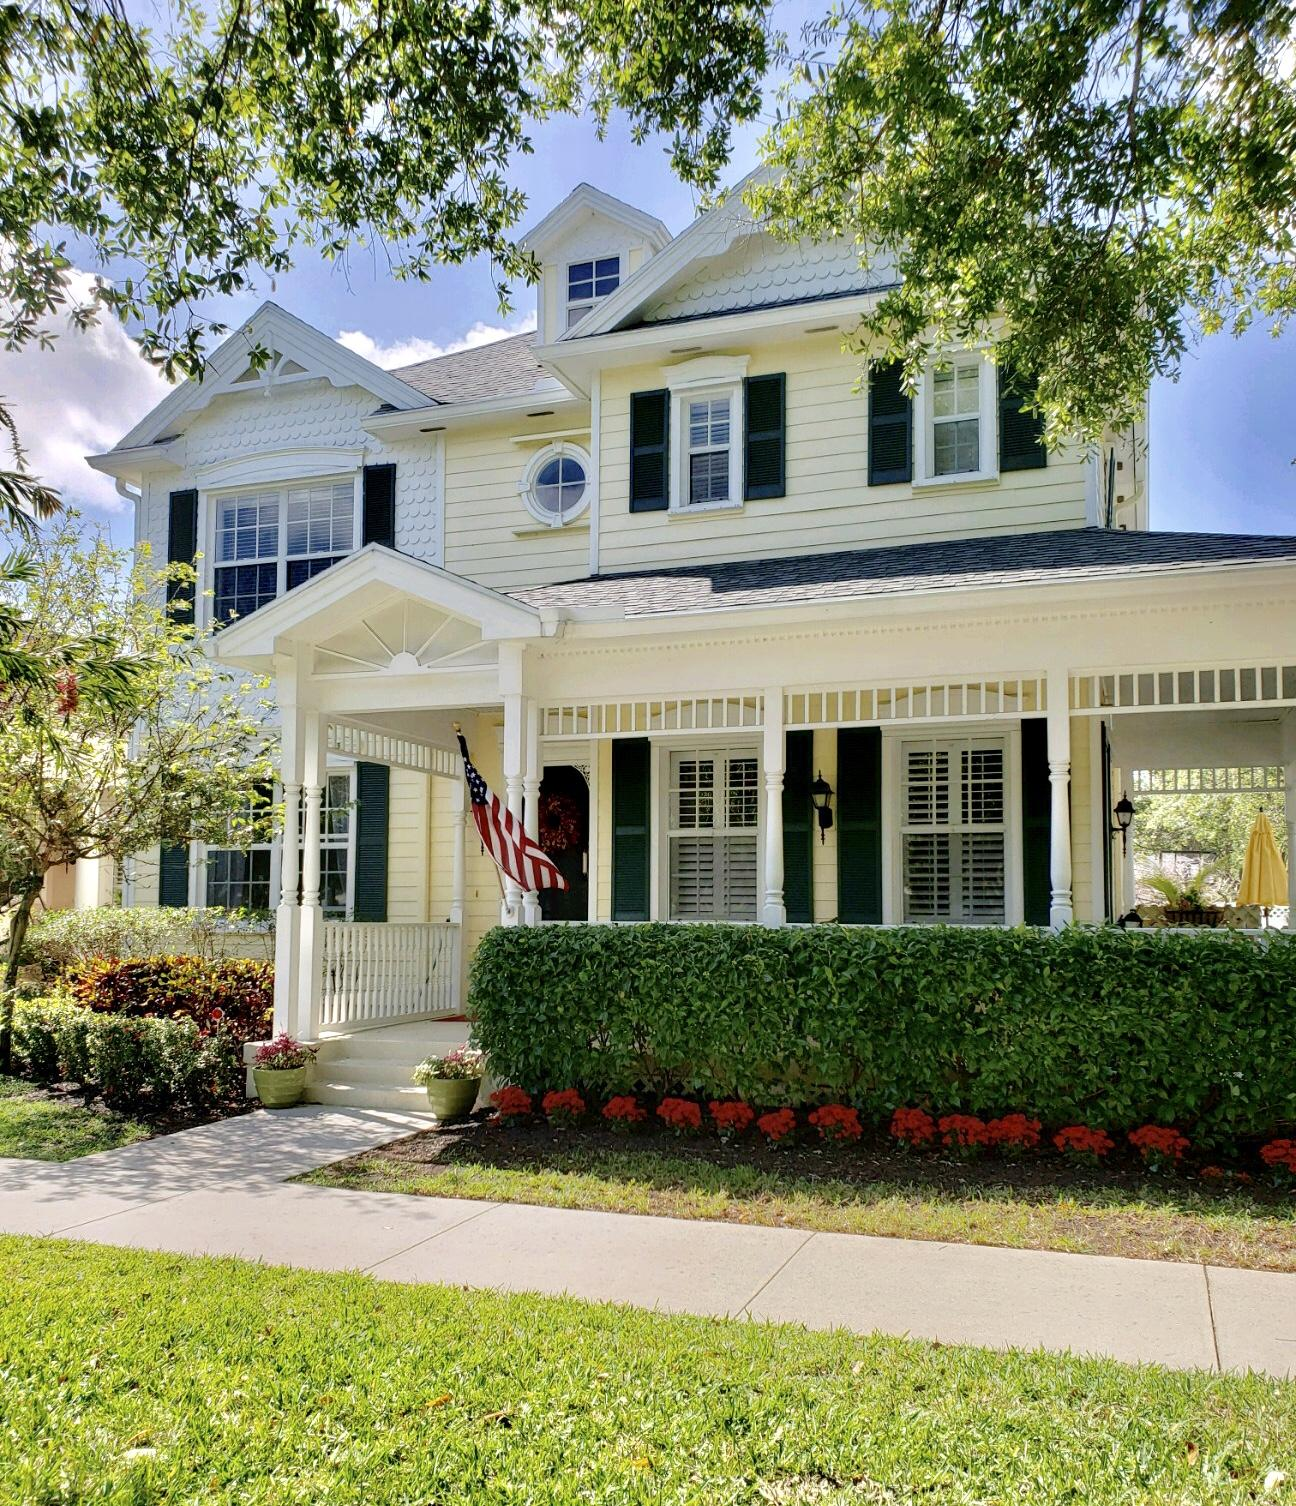 112 Poinciana Drive, Jupiter, Florida 33458, 5 Bedrooms Bedrooms, ,3 BathroomsBathrooms,F,Single family,Poinciana,RX-10517897